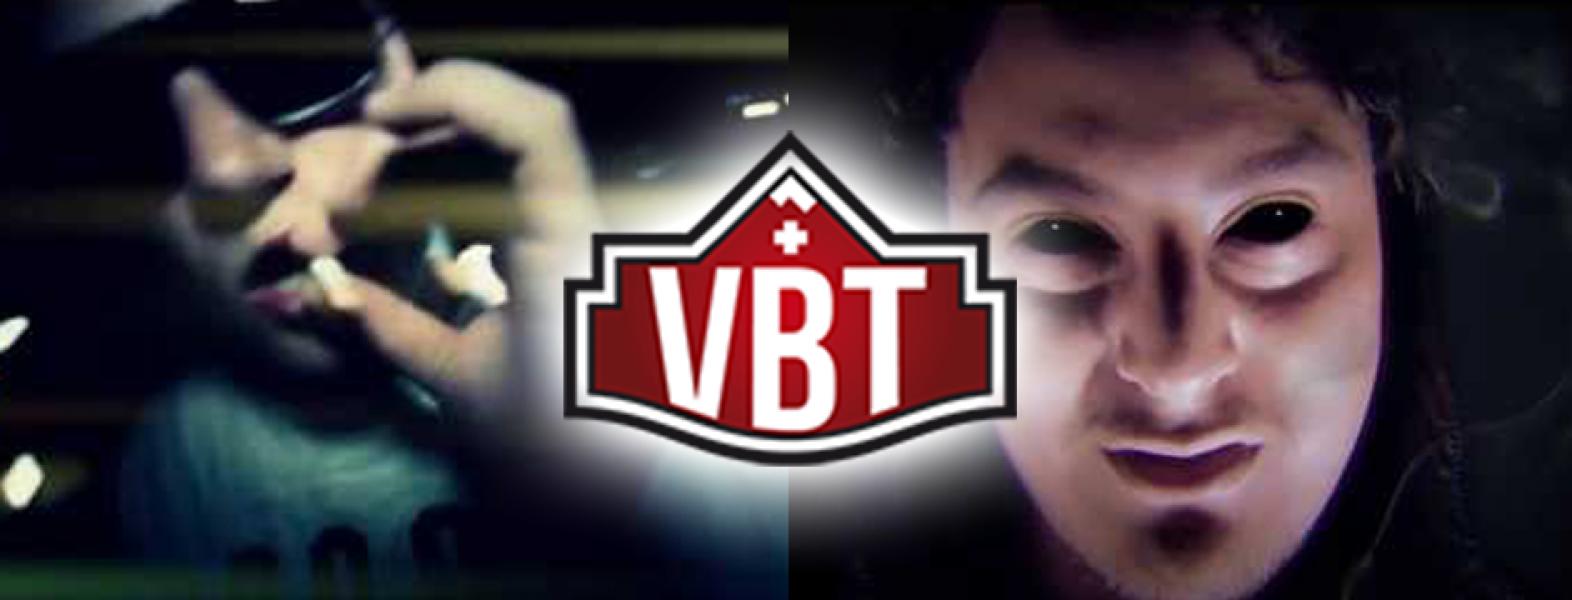 MadCed vs. Jones Burnout – VBT 2013 Halbfinale